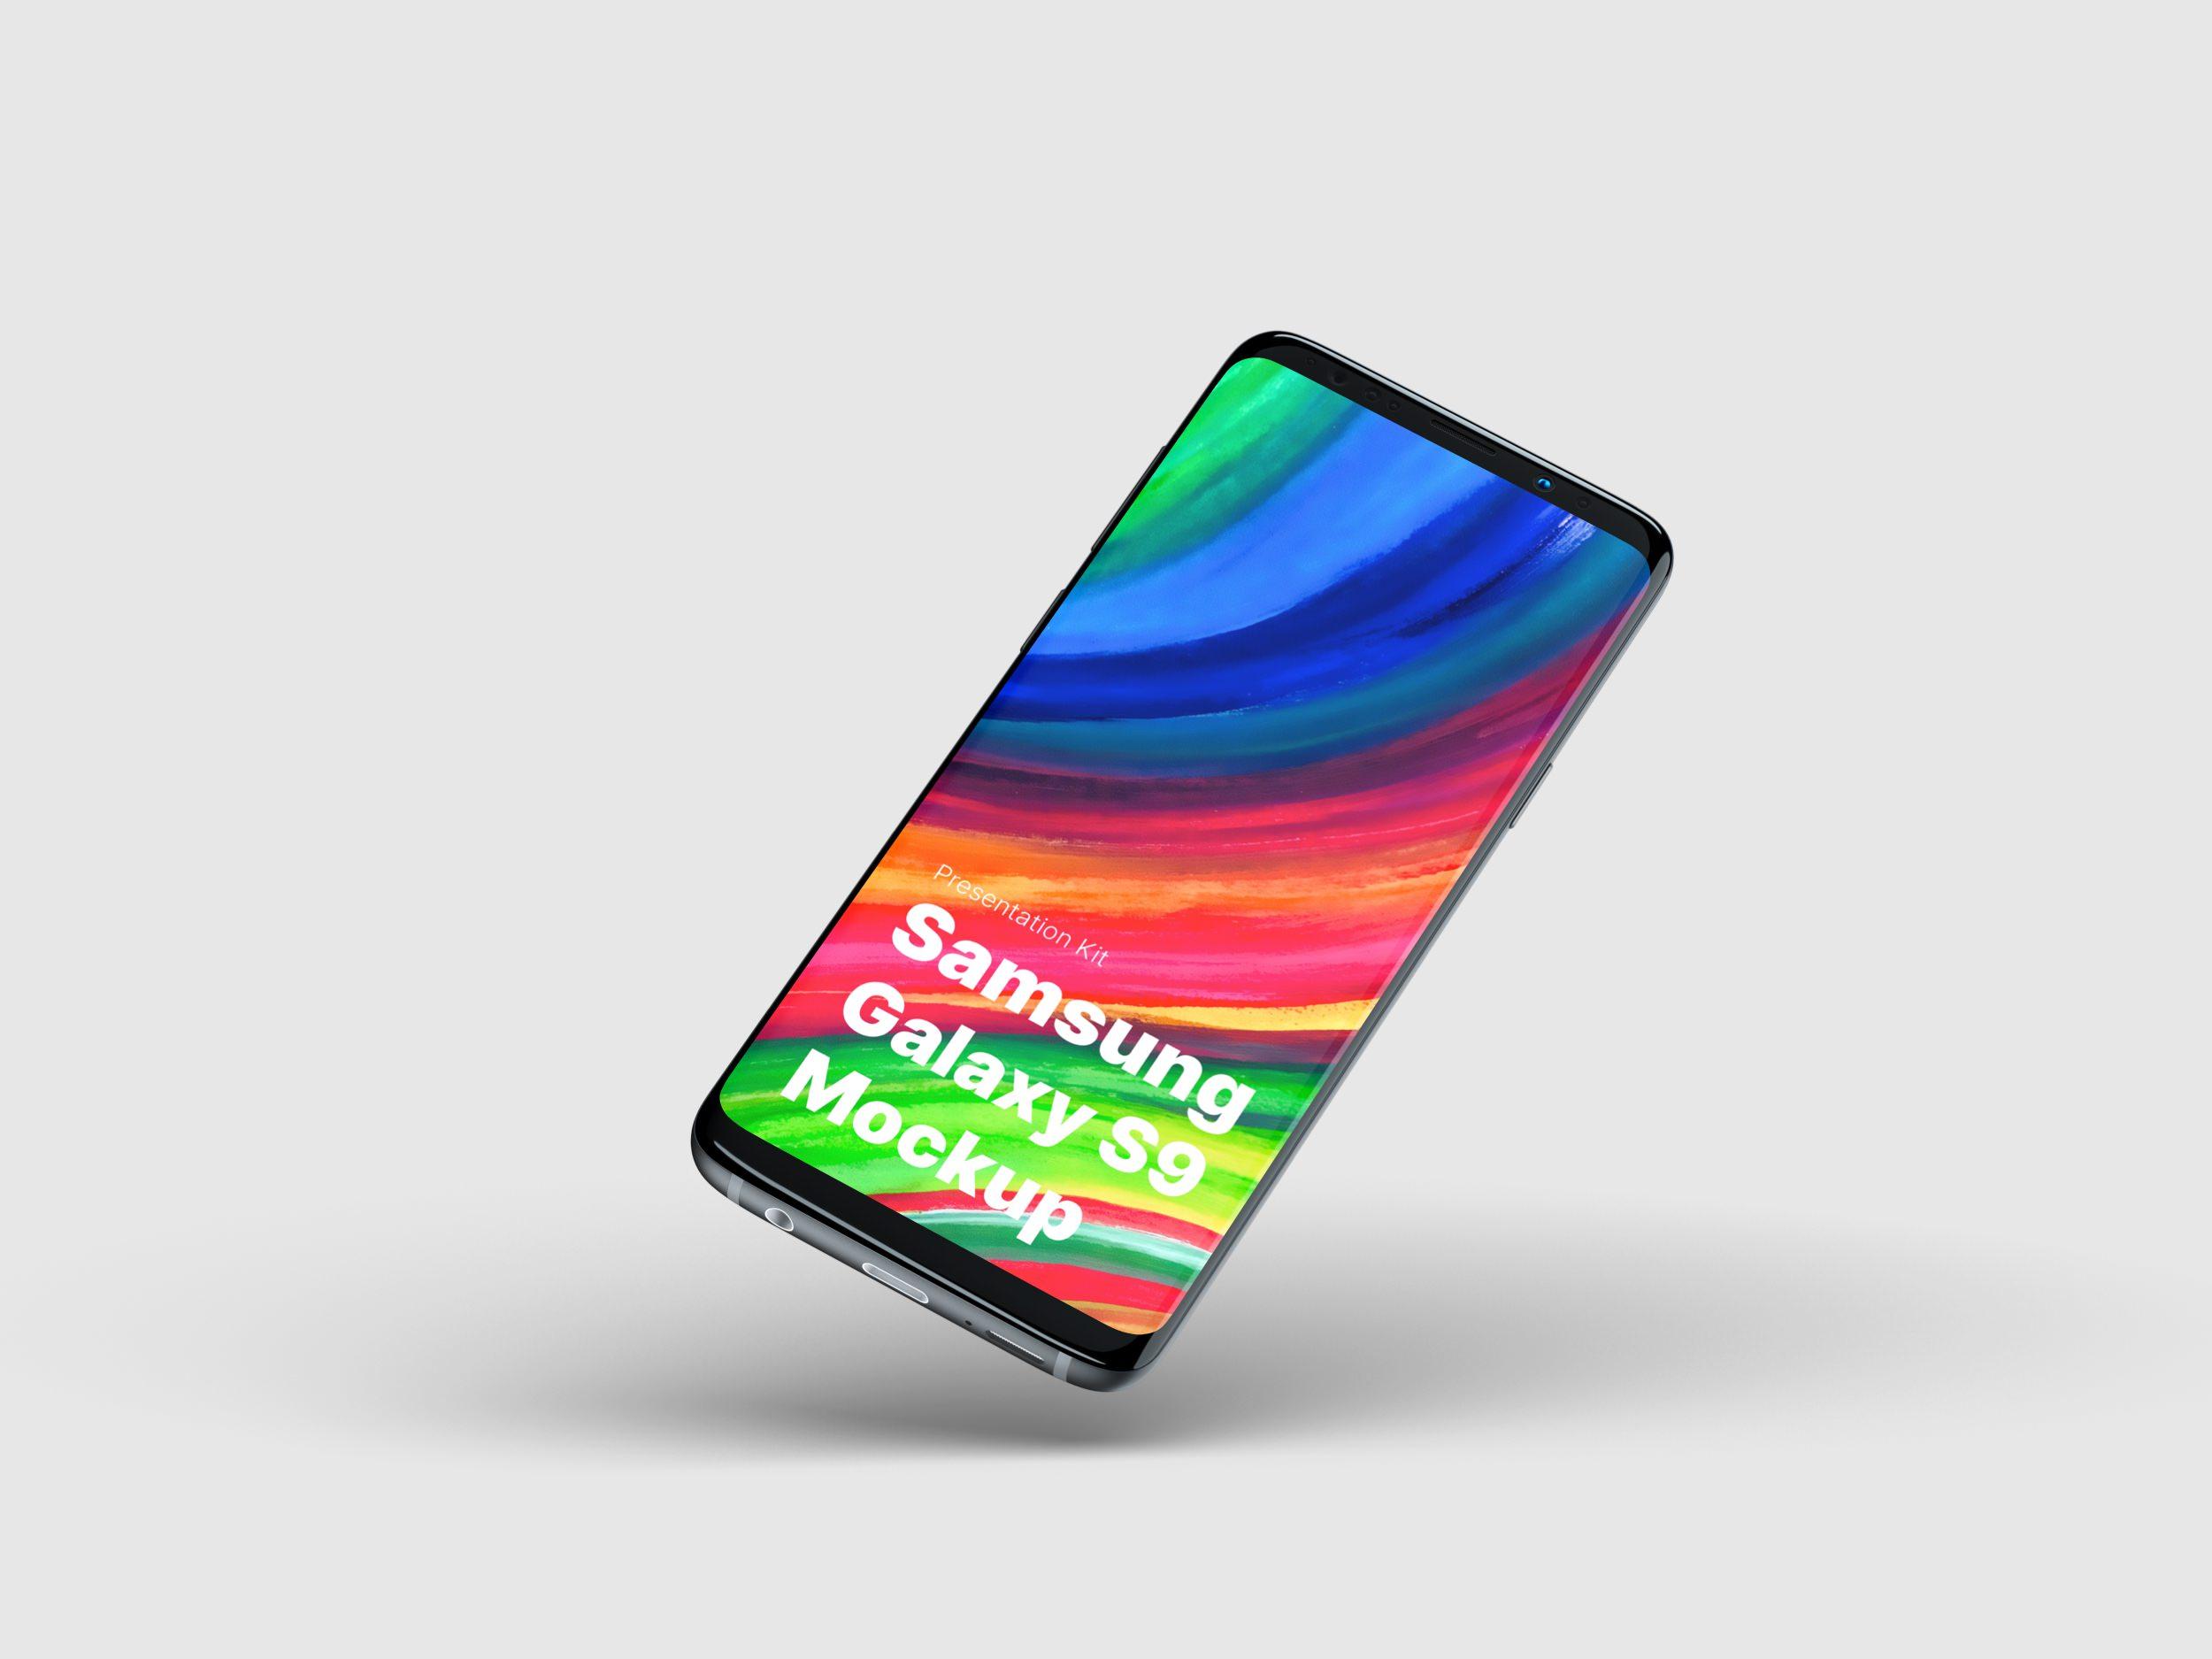 Samsung Galaxy S9 Mockup for Sketch, Photoshop, Figma